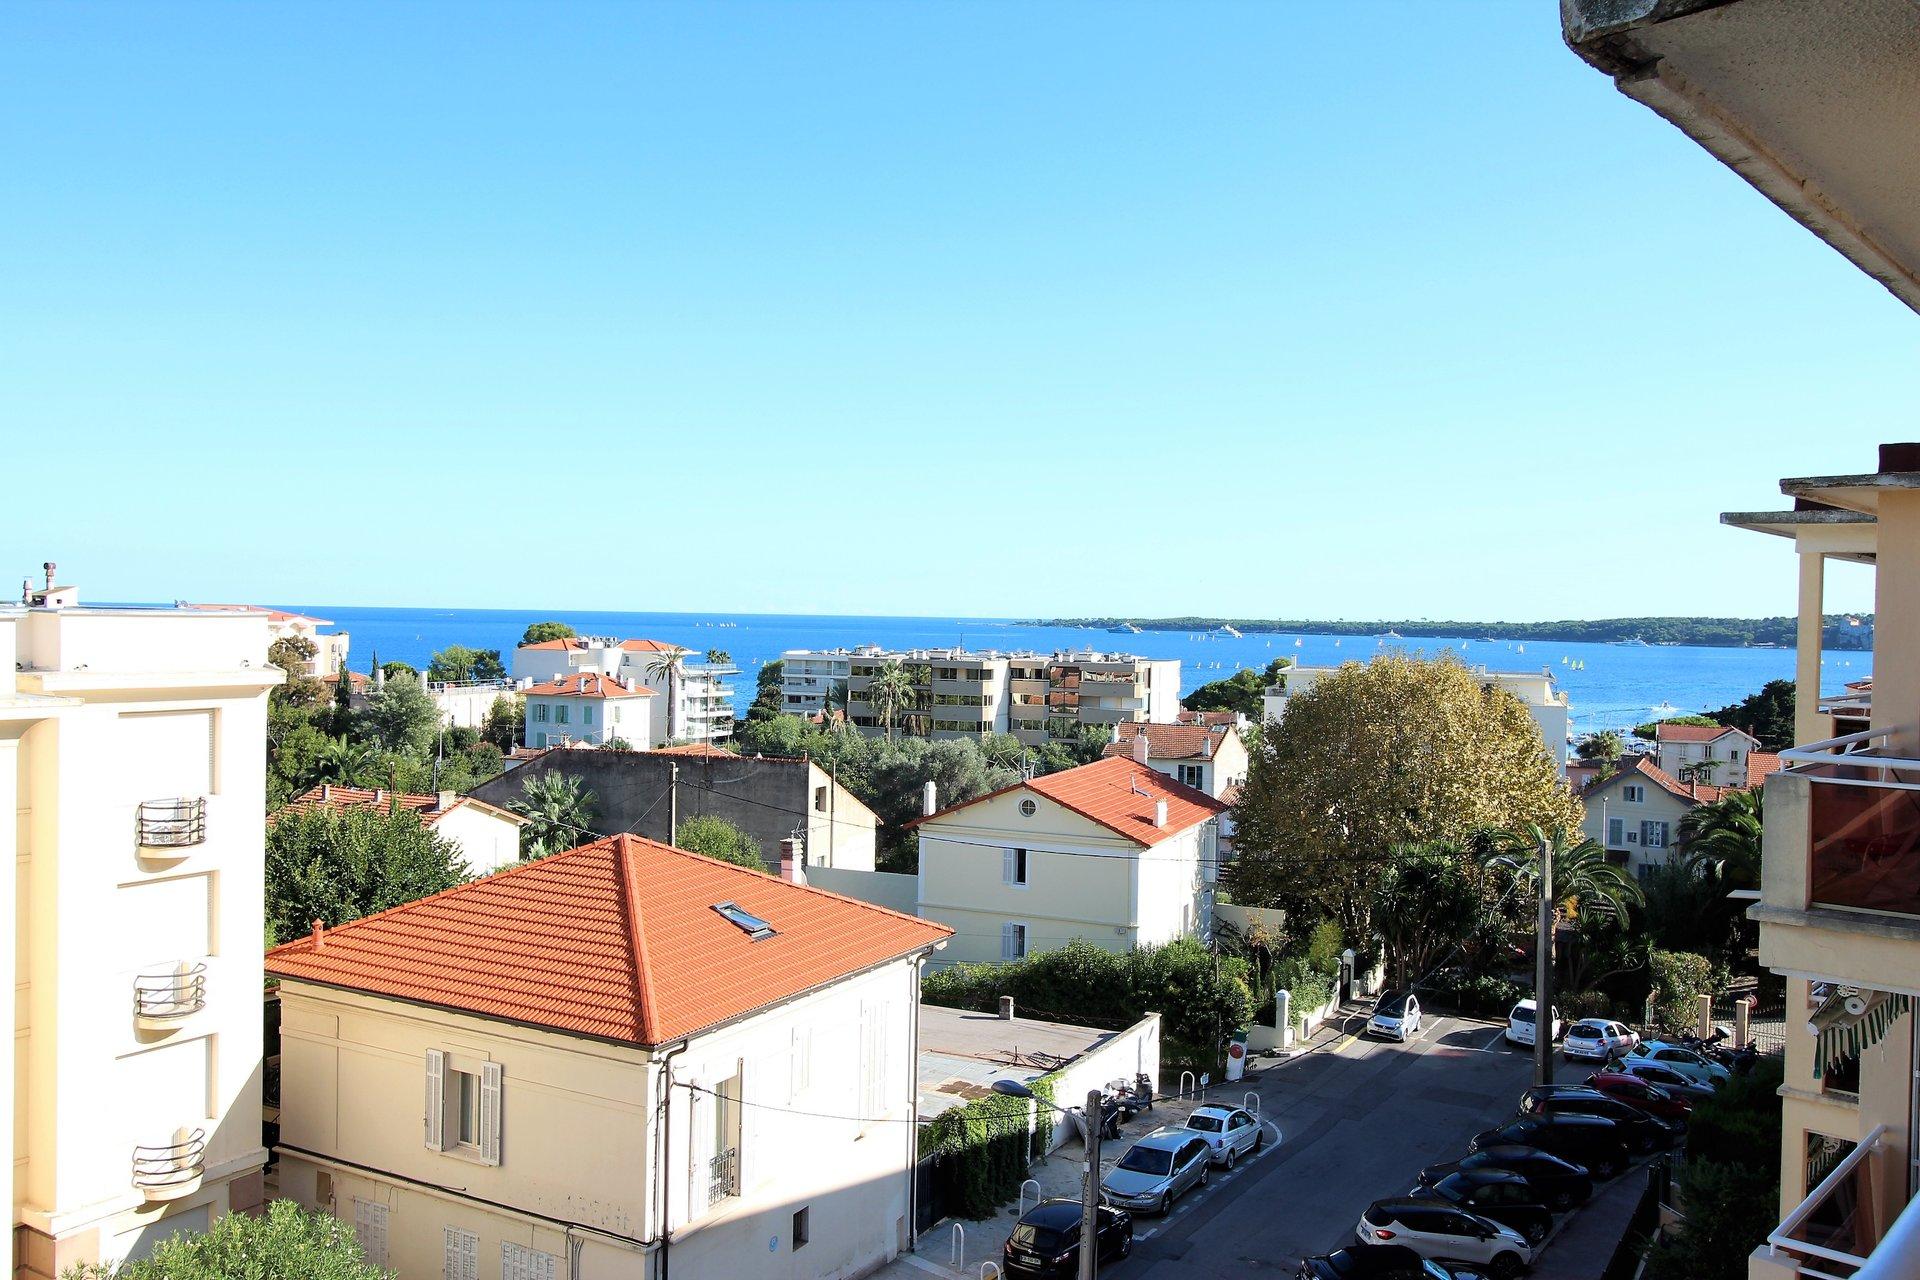 Cannes, Basse-Californie, 1 bedroom apartment on the top floor.